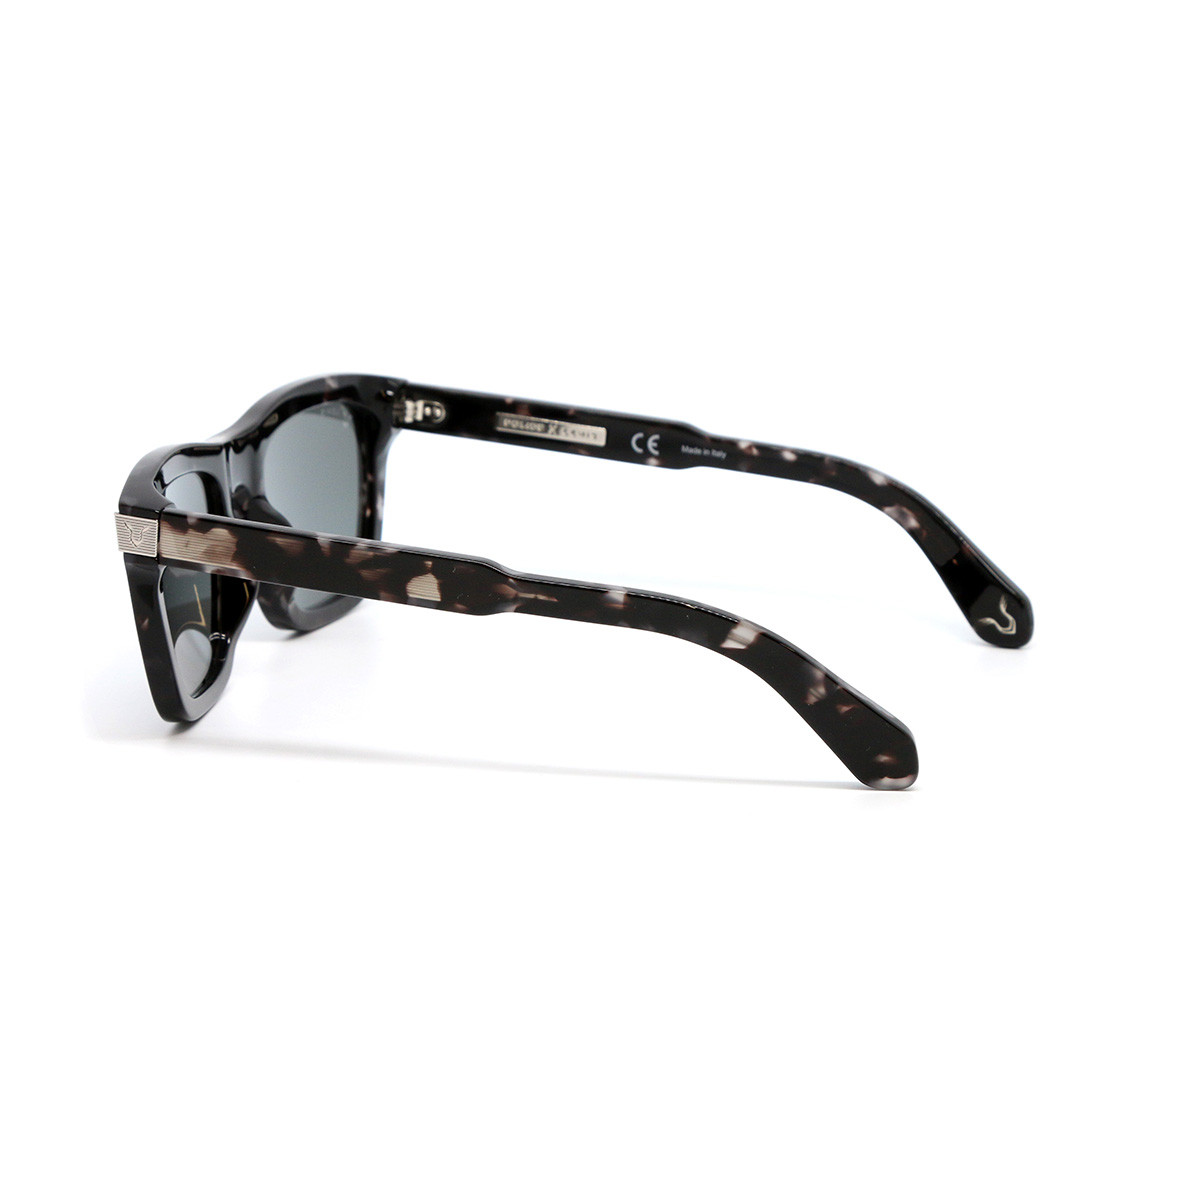 Солнцезащитные очки Police SPLB32 0721 53 Фото №2 - linza.com.ua